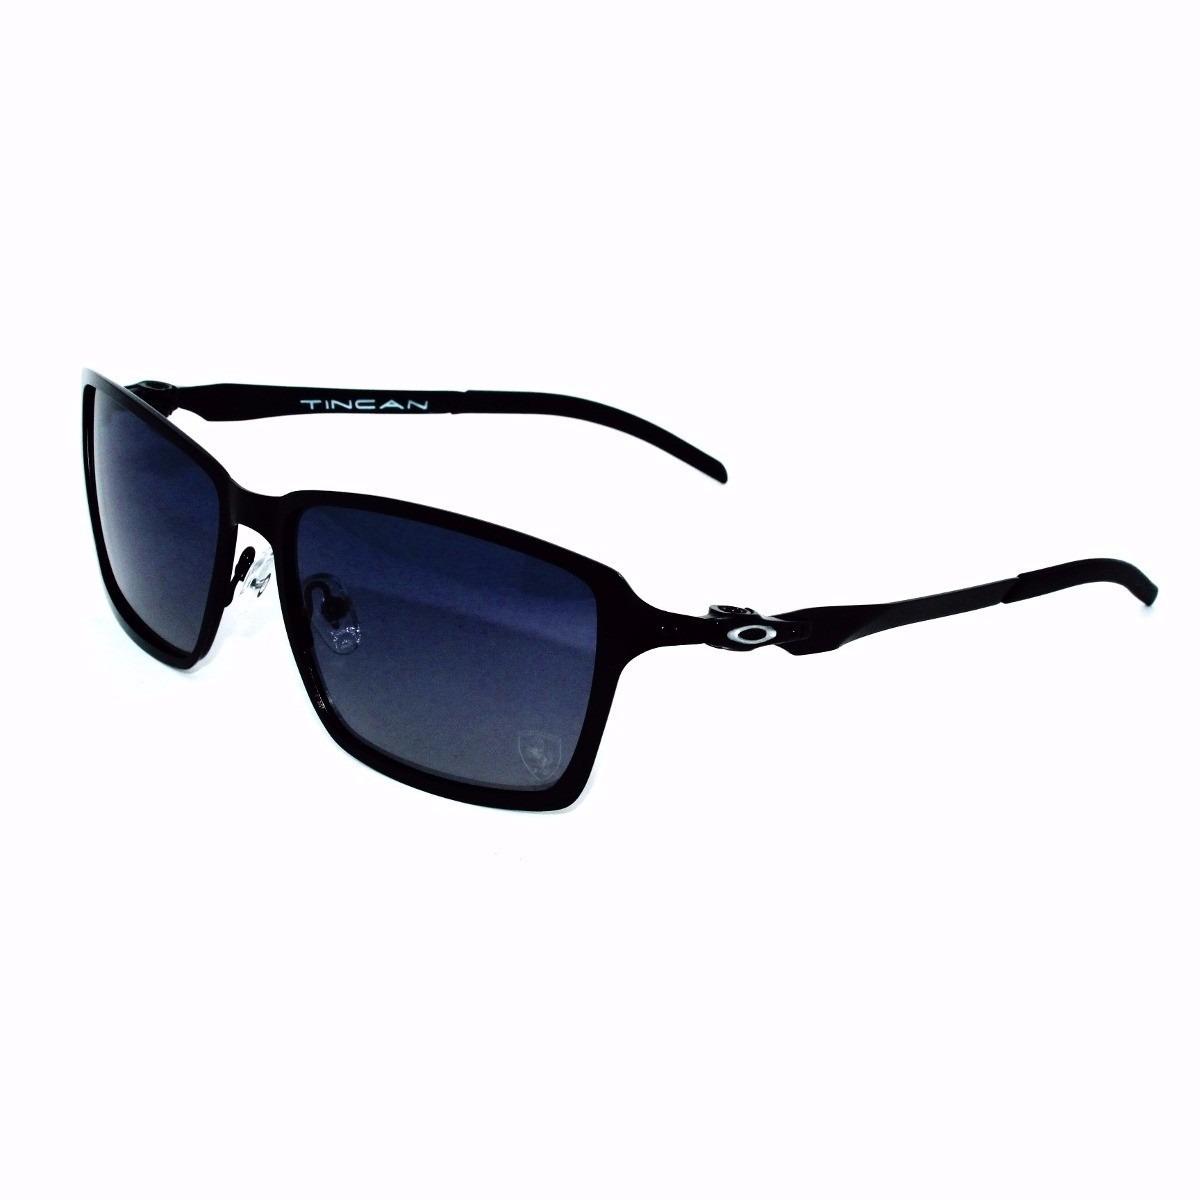 3d71a2786a996 Óculos Oakley Tincan Ferrari 100% Polarizado Promoção!!! - R  159